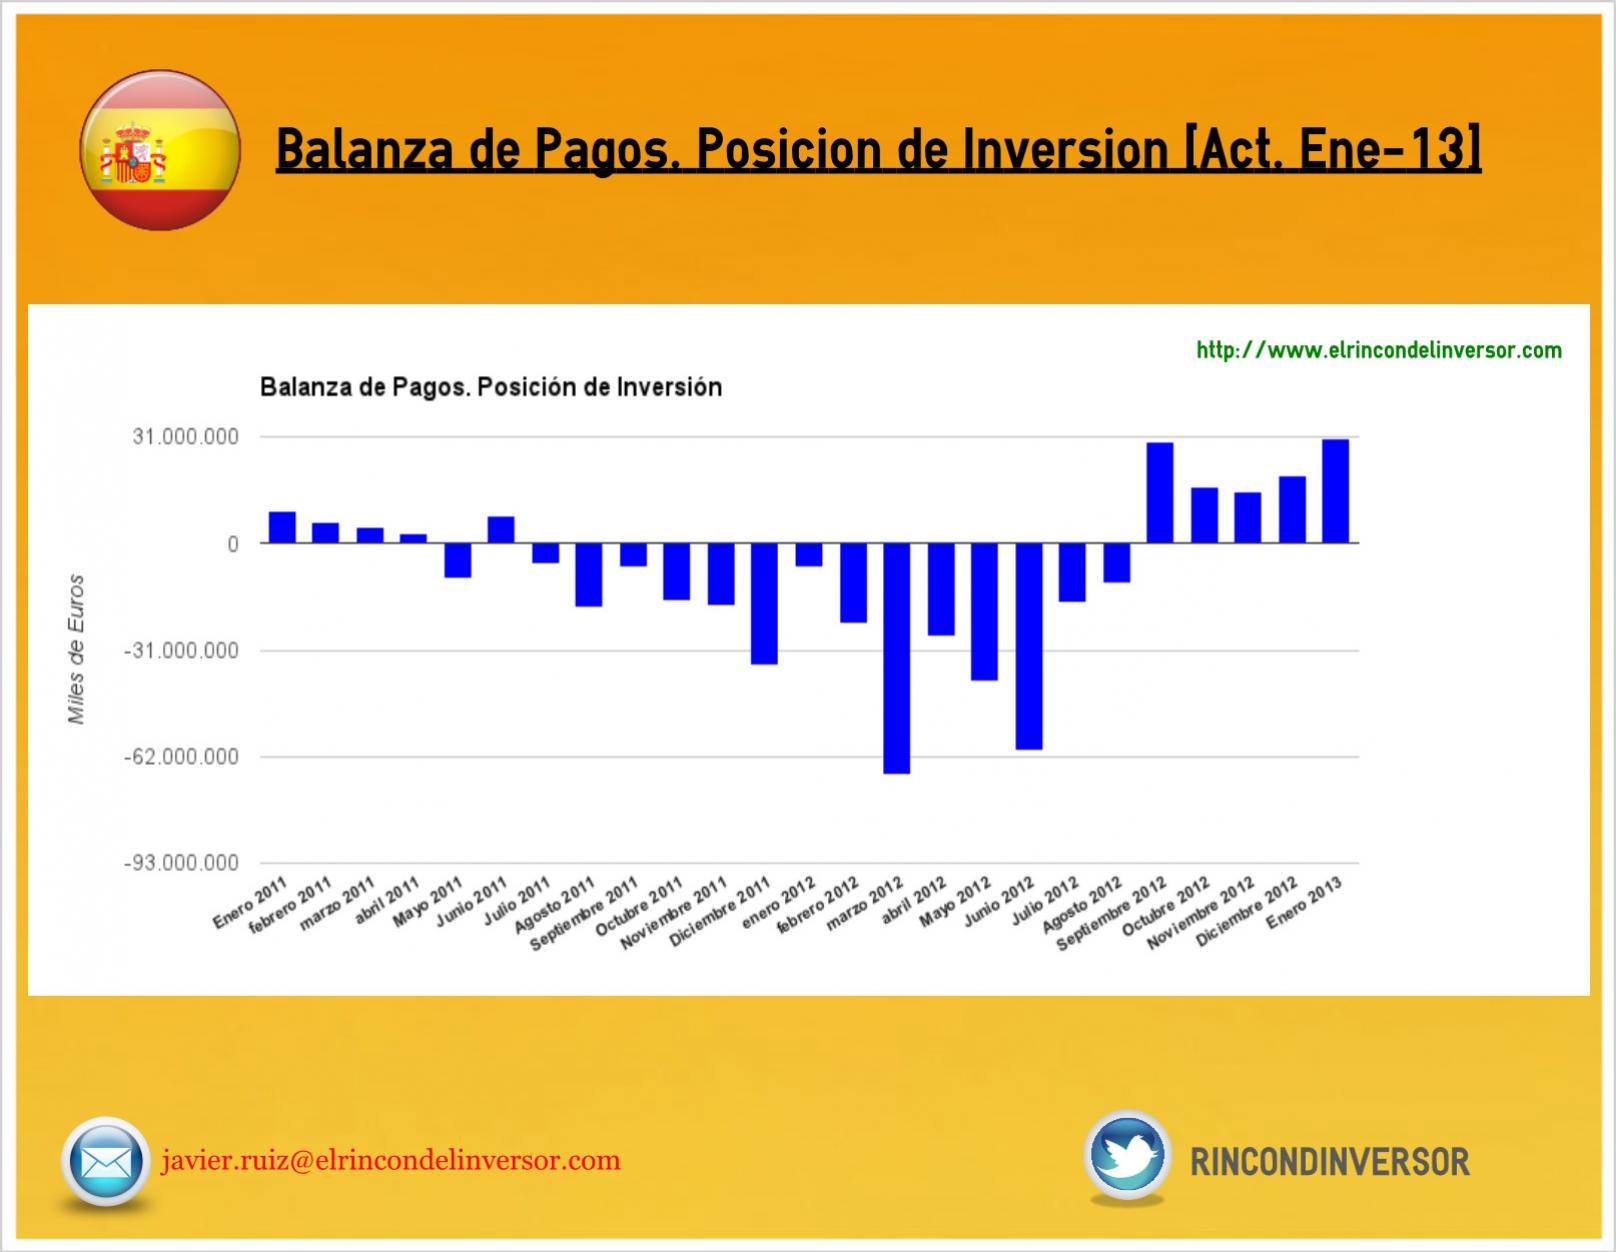 balanza_pagos_act_ene13.jpg